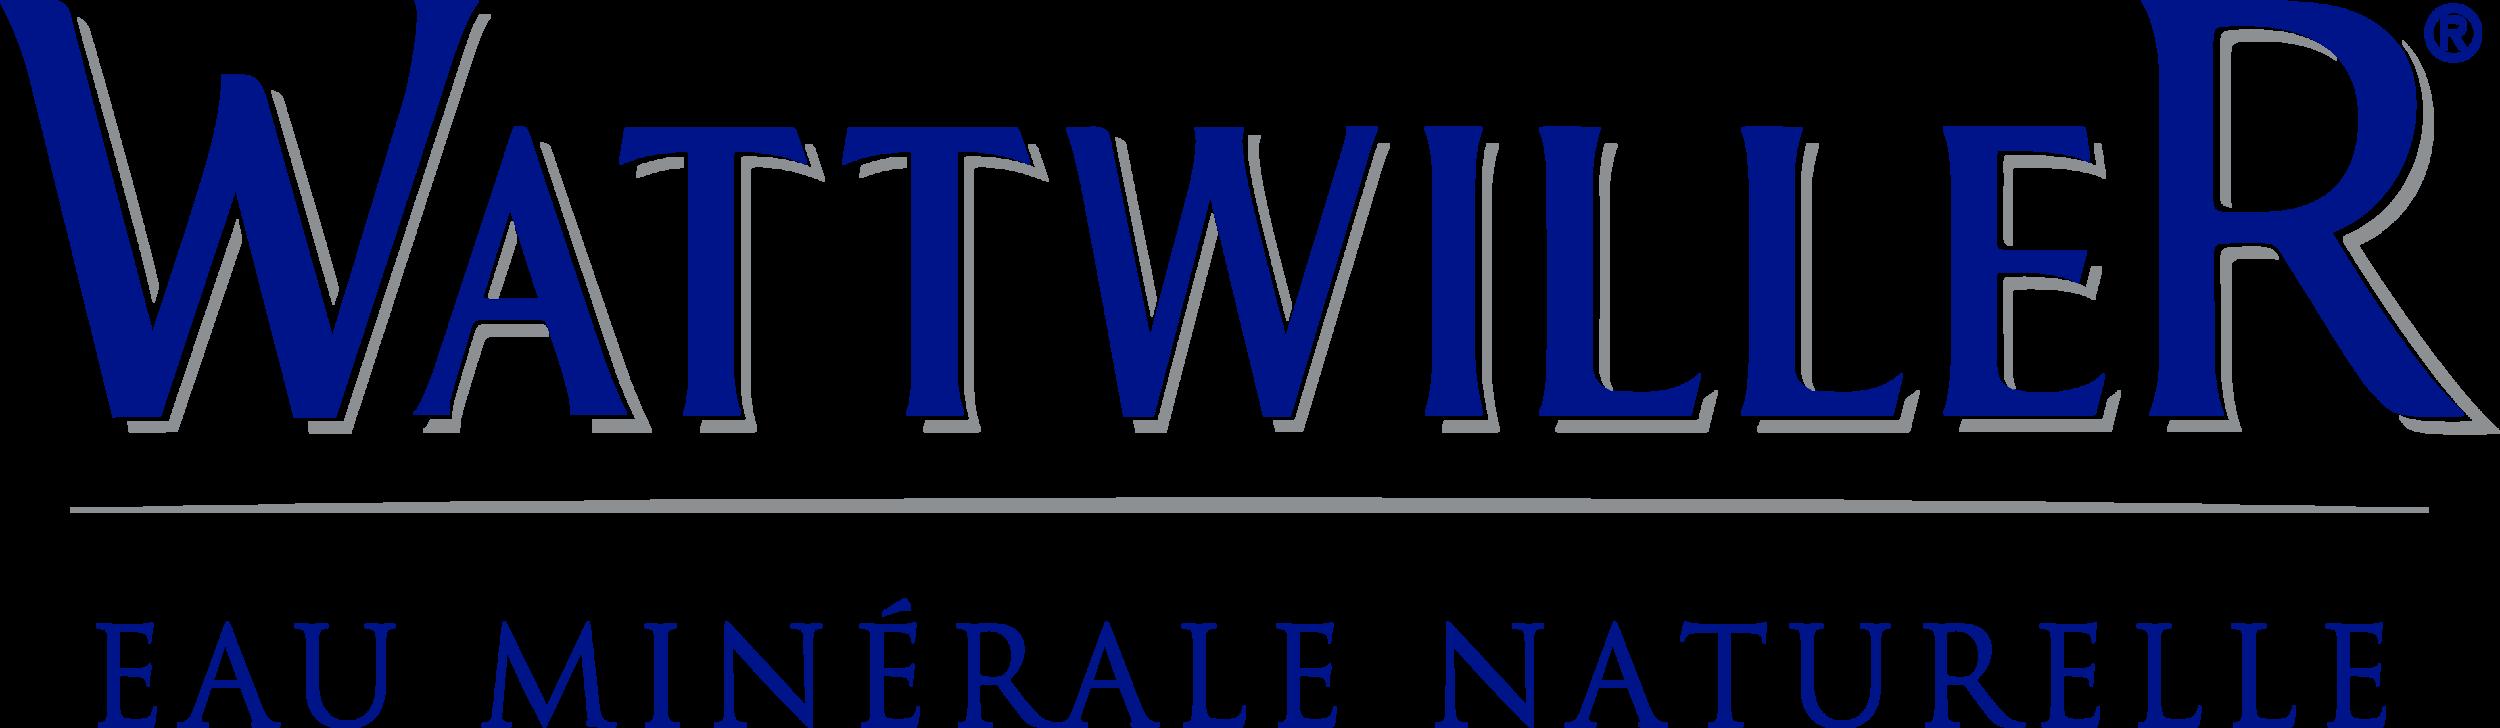 Wattwiller_Logo Typo EMN_RVB.png